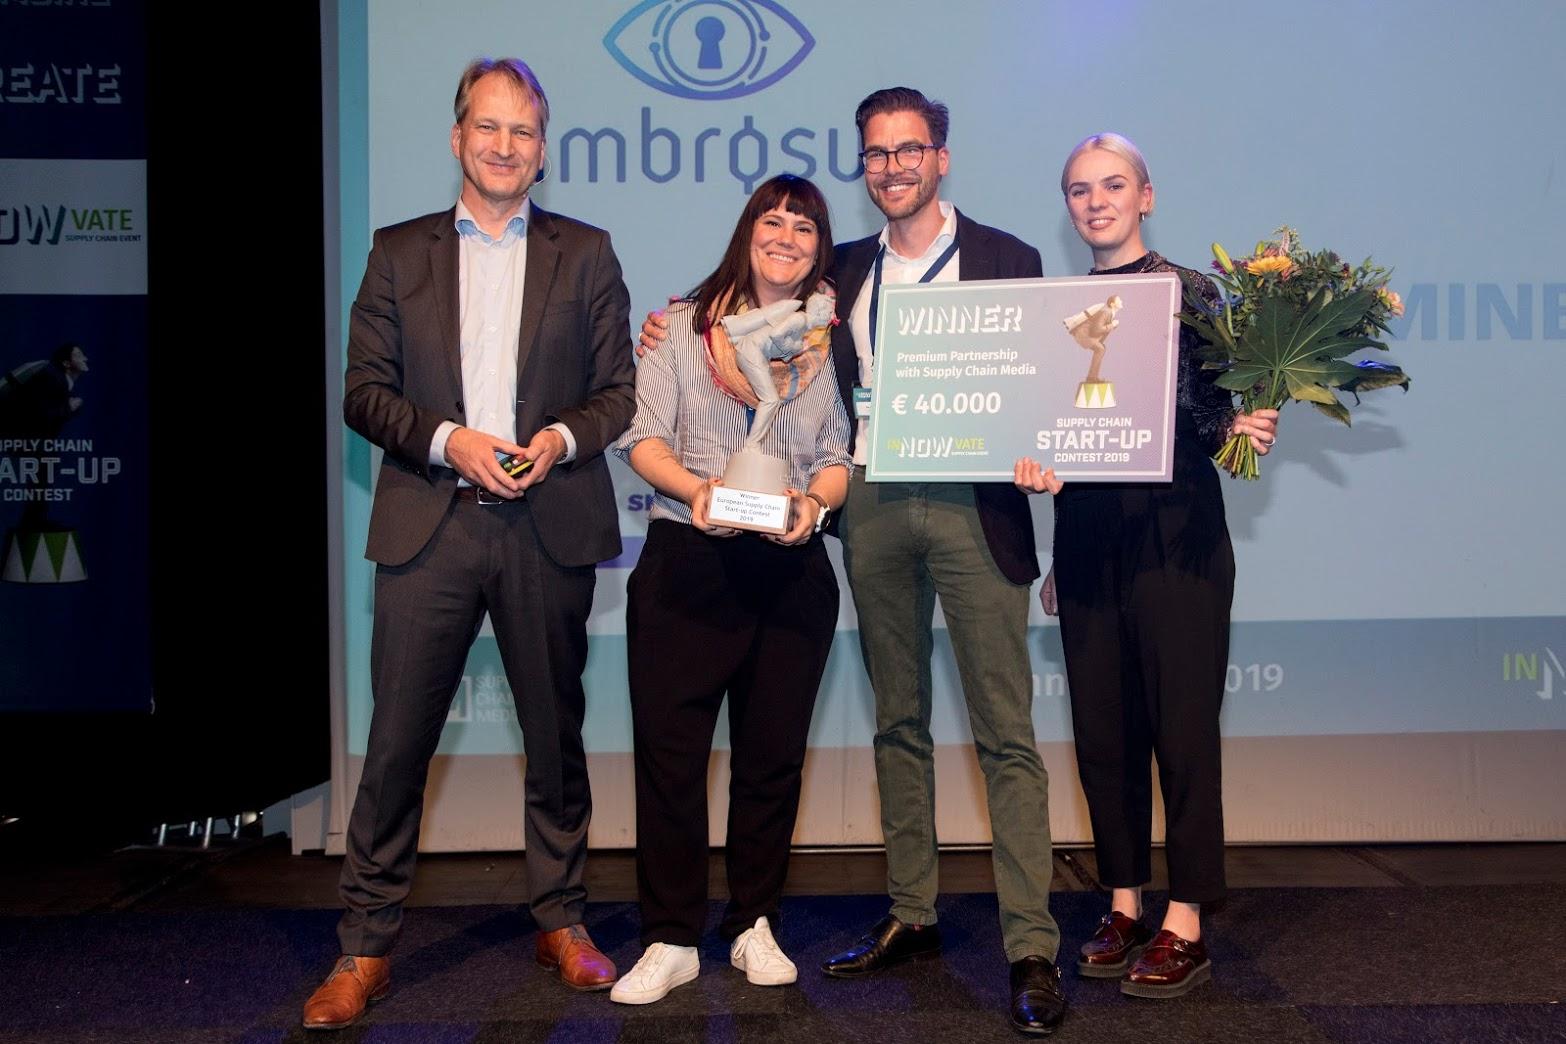 Circular IQ wins second European Supply Chain Start-up Contest